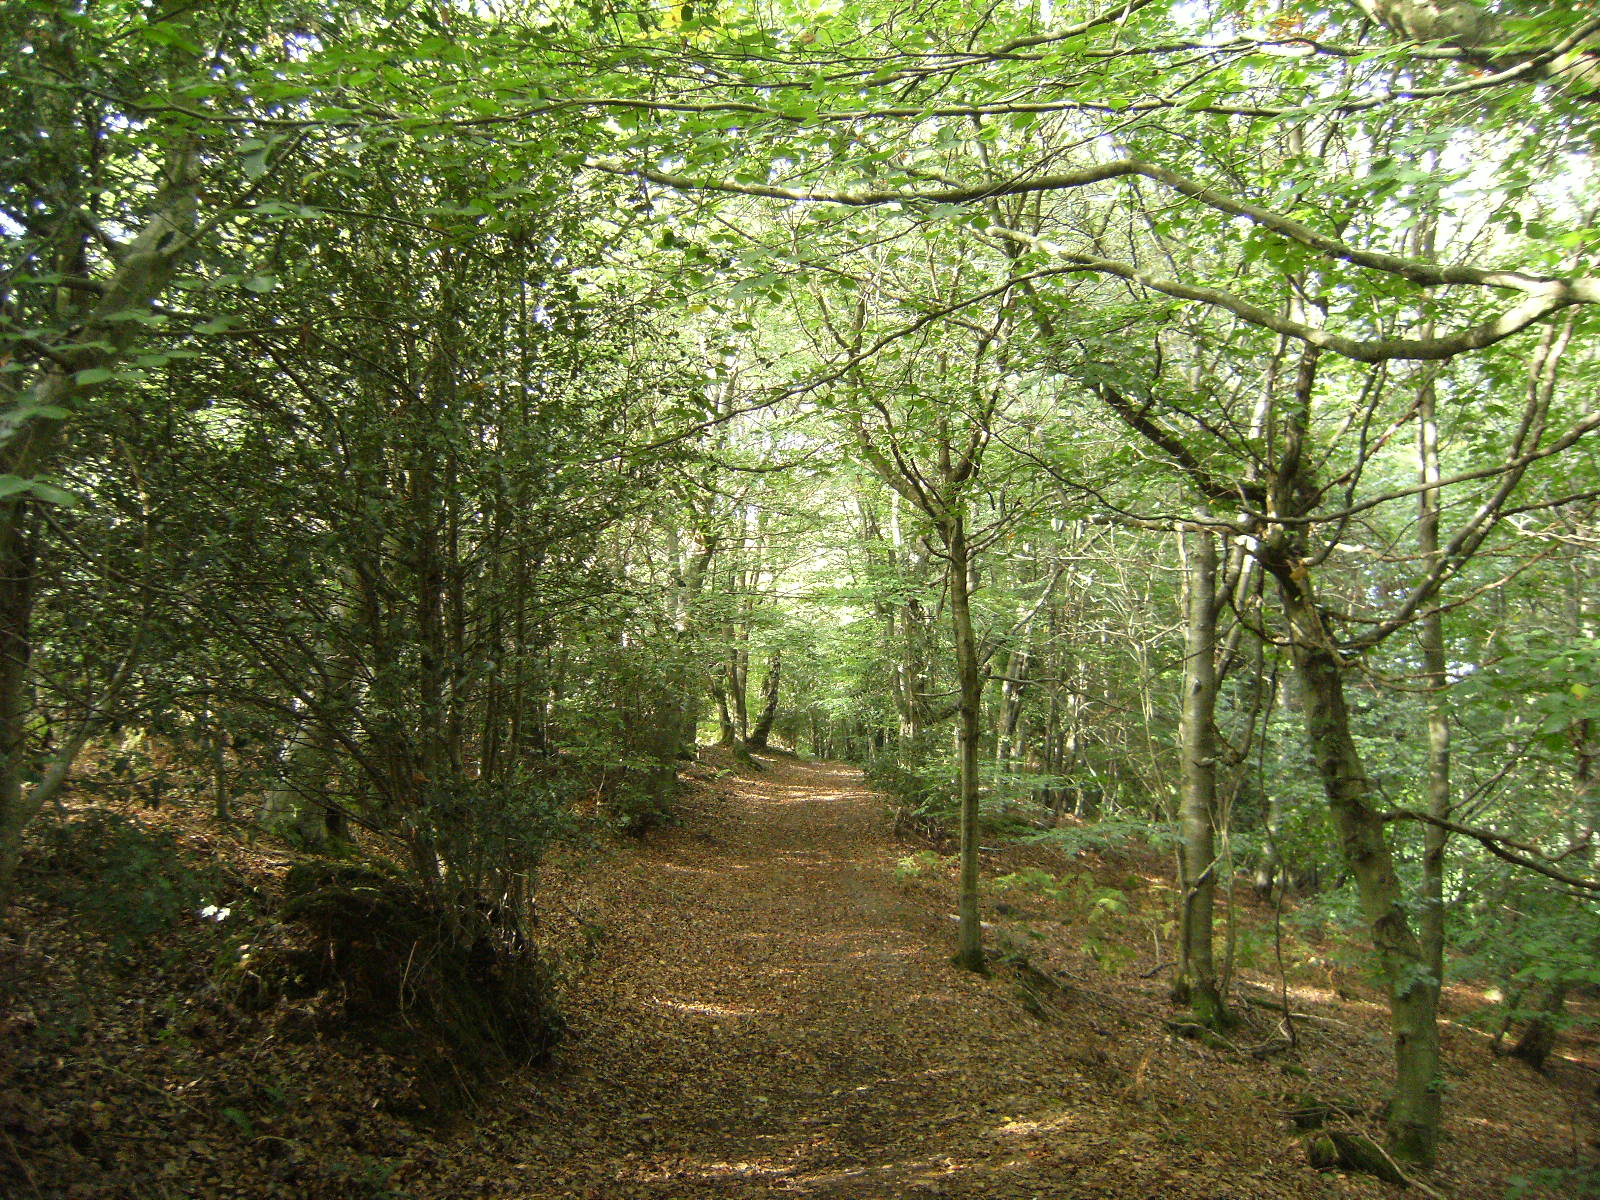 DSCF9682 Through Grinstead Wood